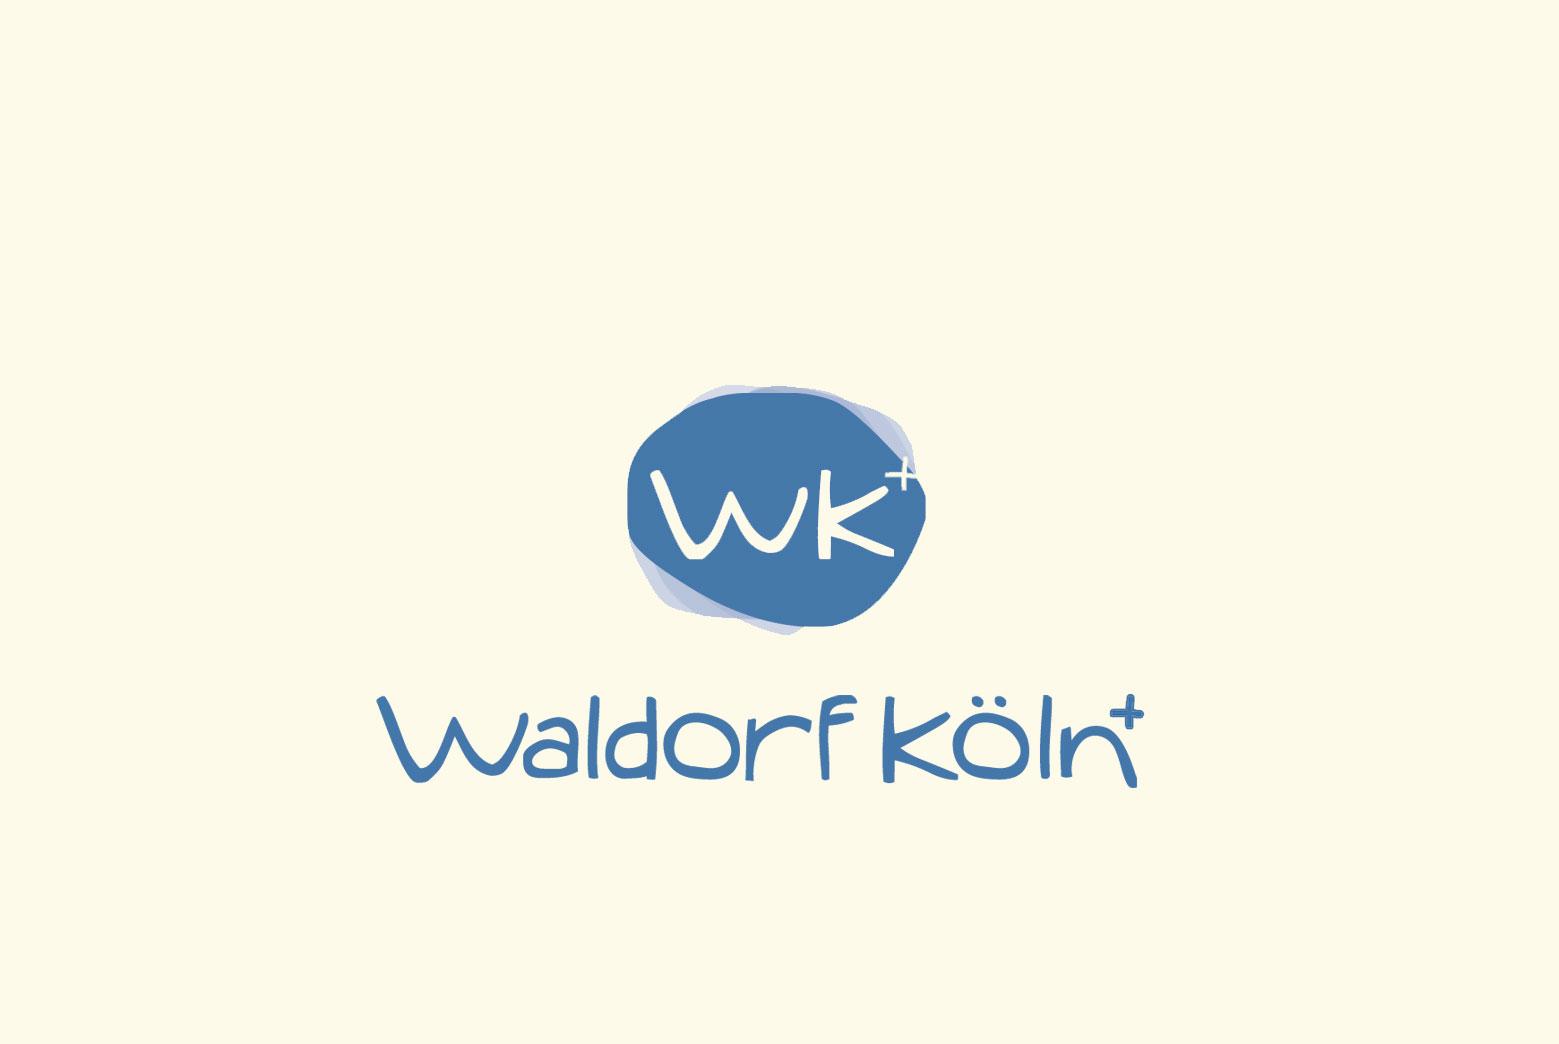 waldorf4